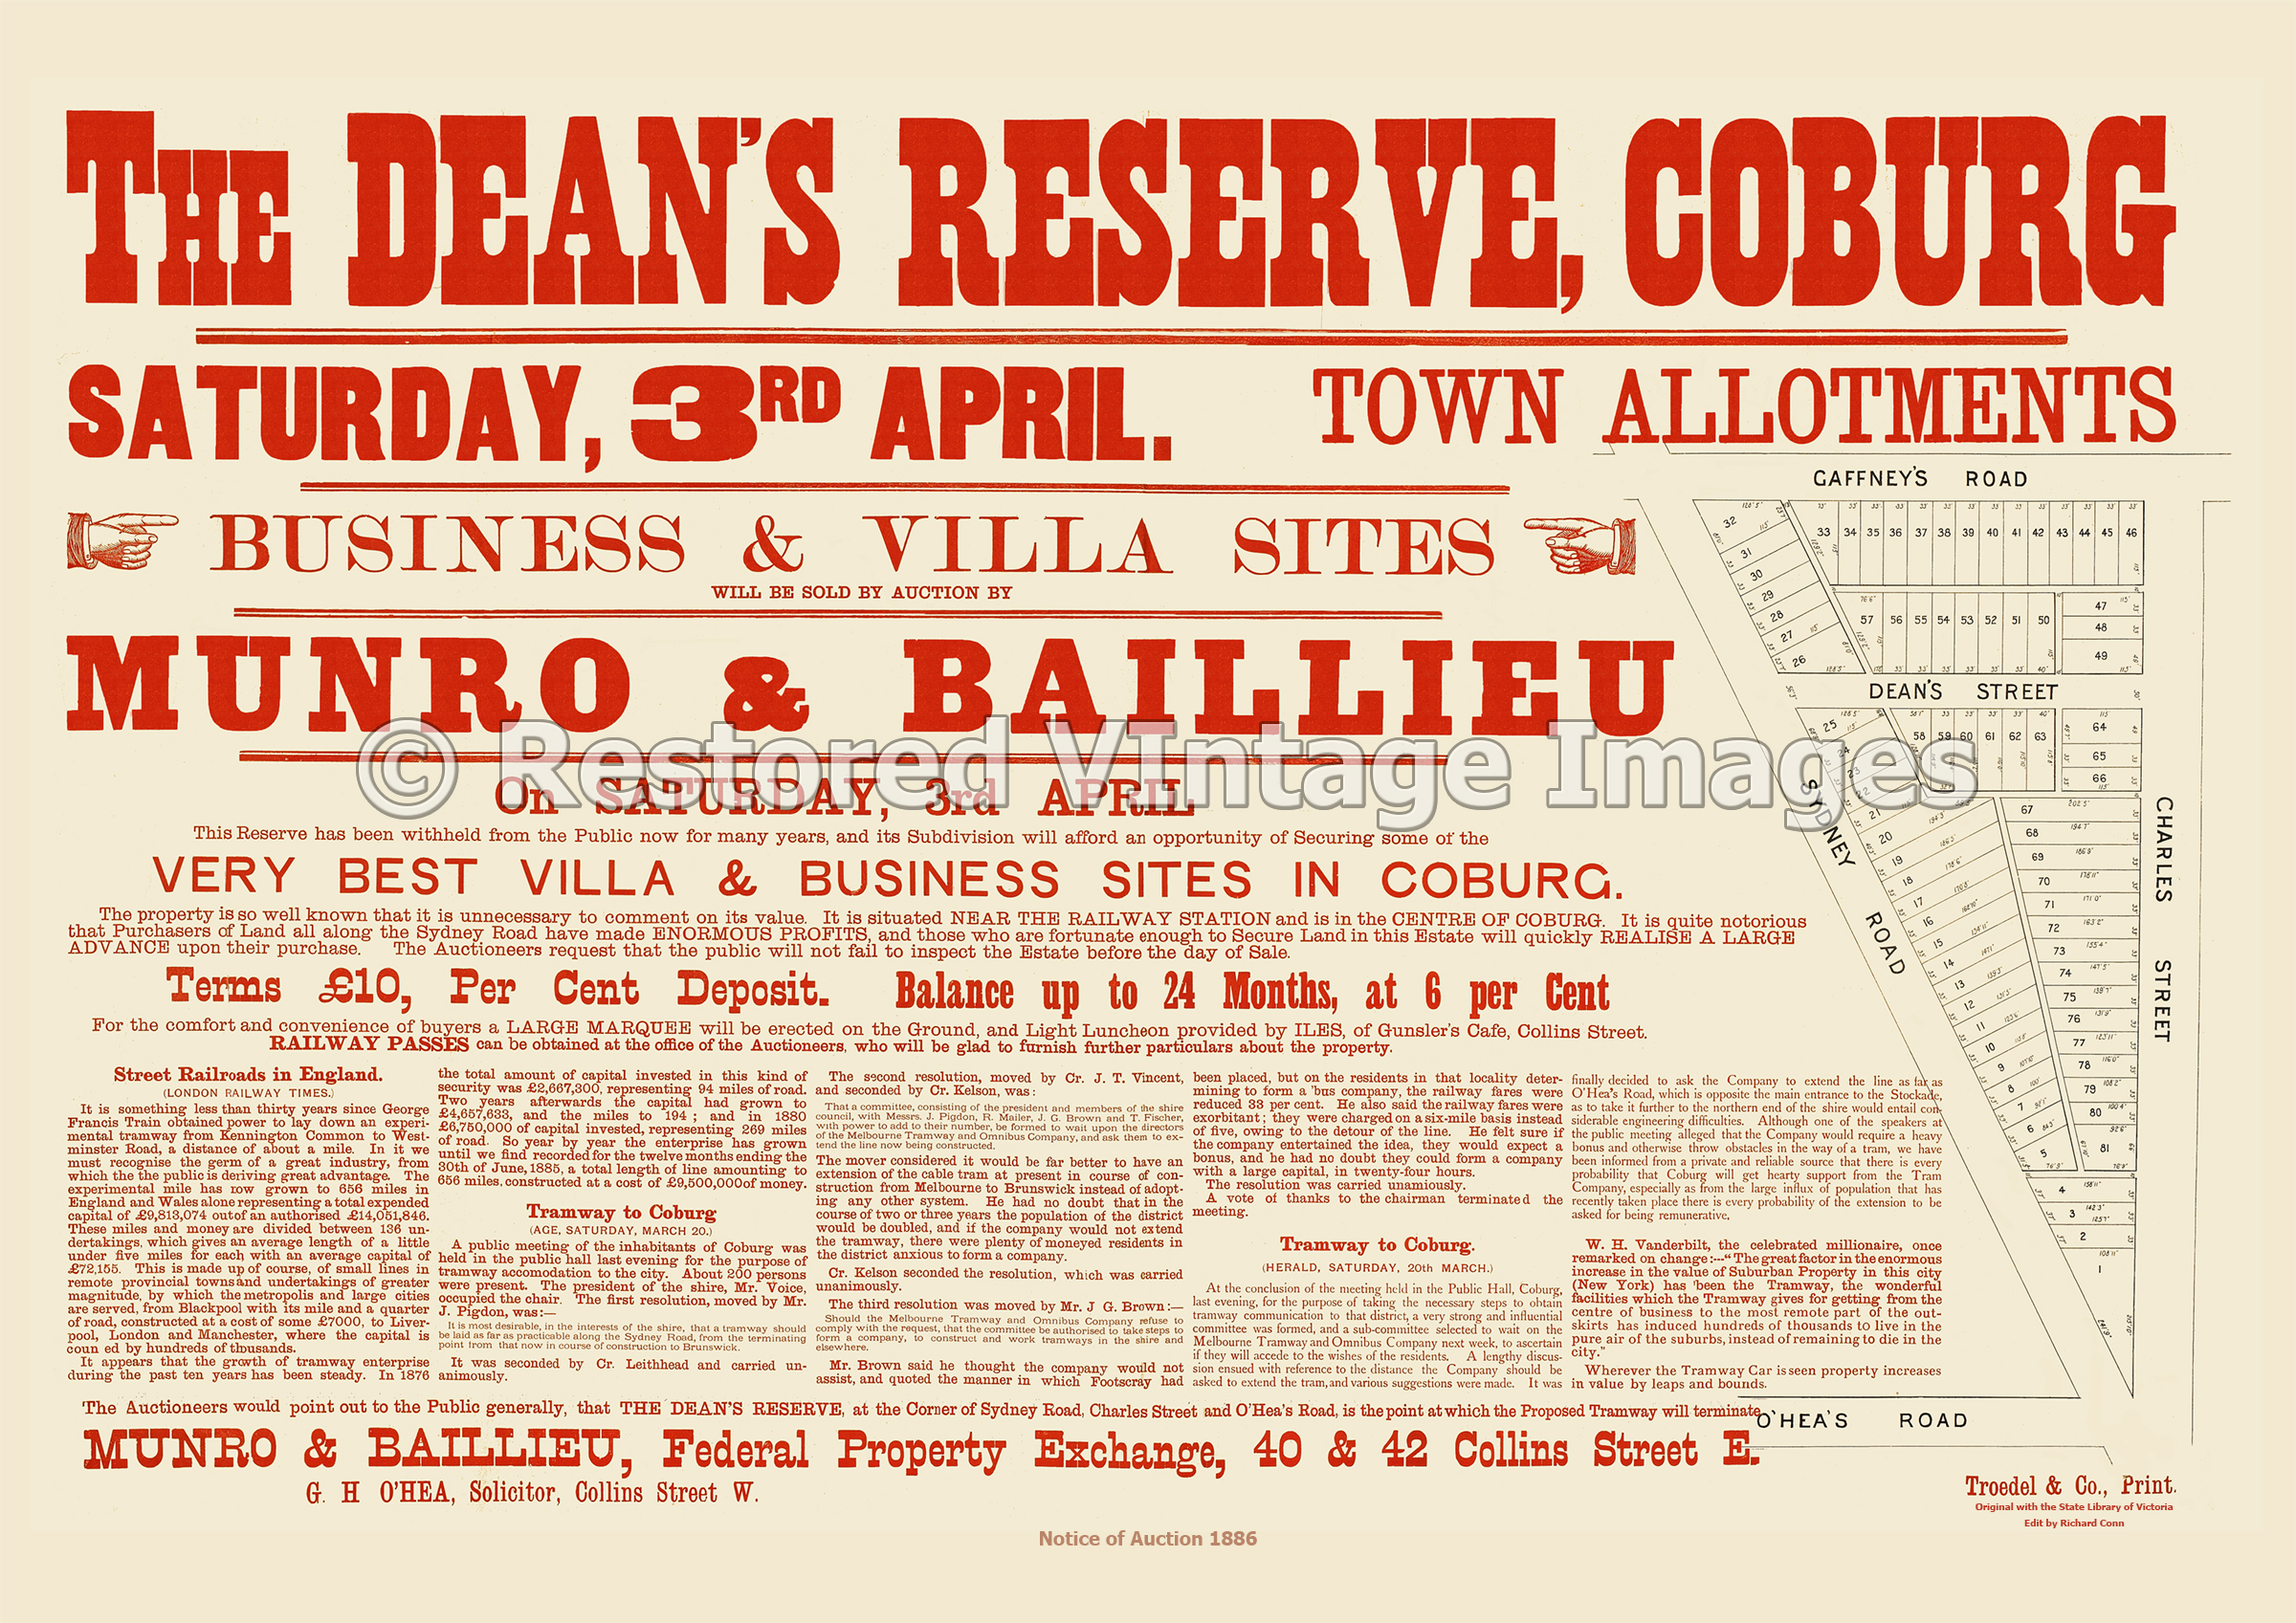 The Dean's Reserve Coburg 3rd April 1886 – Coburg